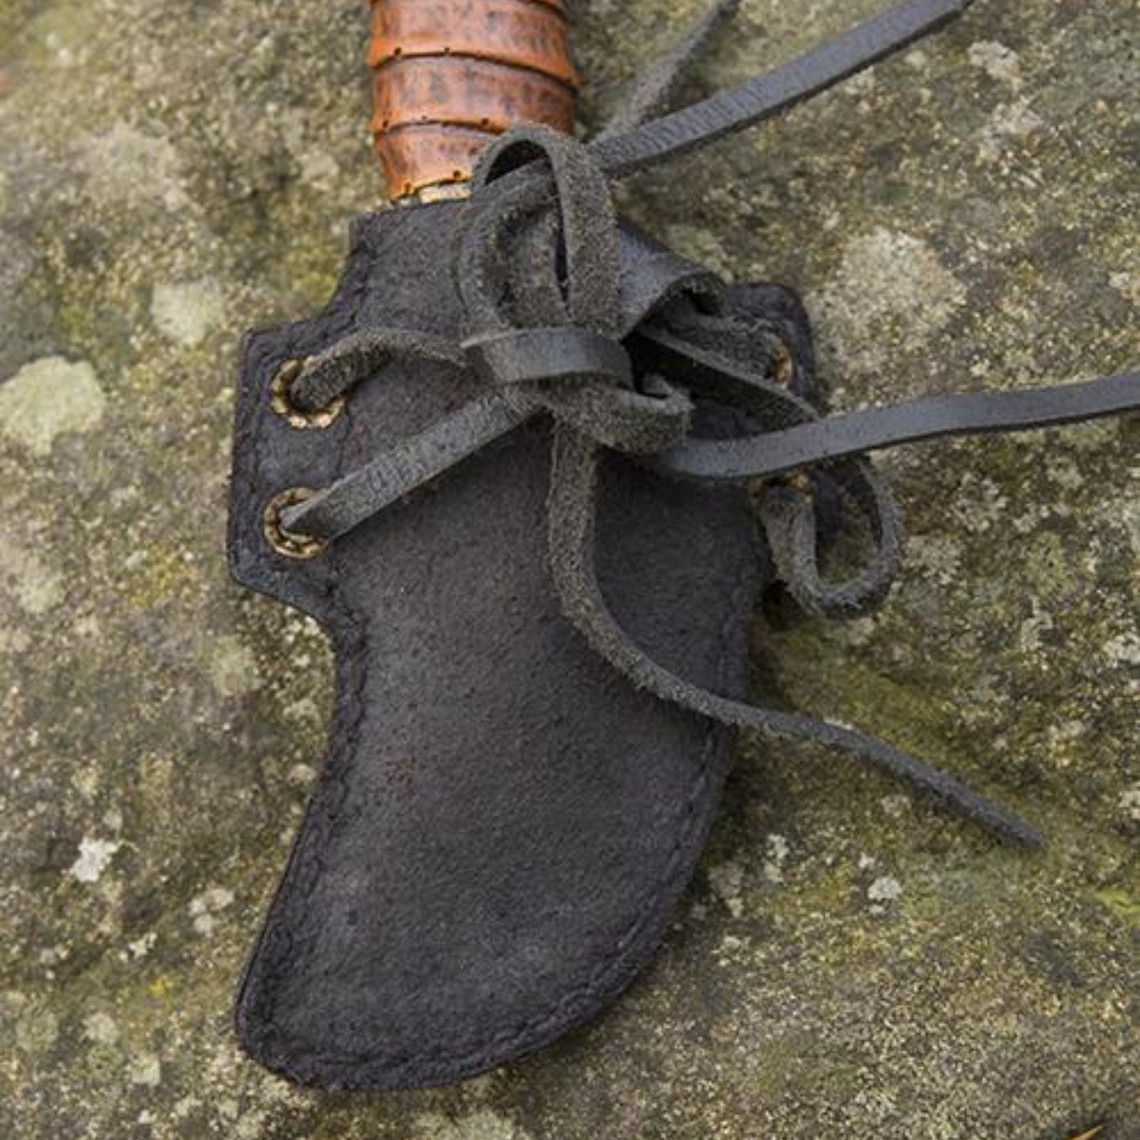 Epic Armoury LARP cuchillo desollador con soporte, negro